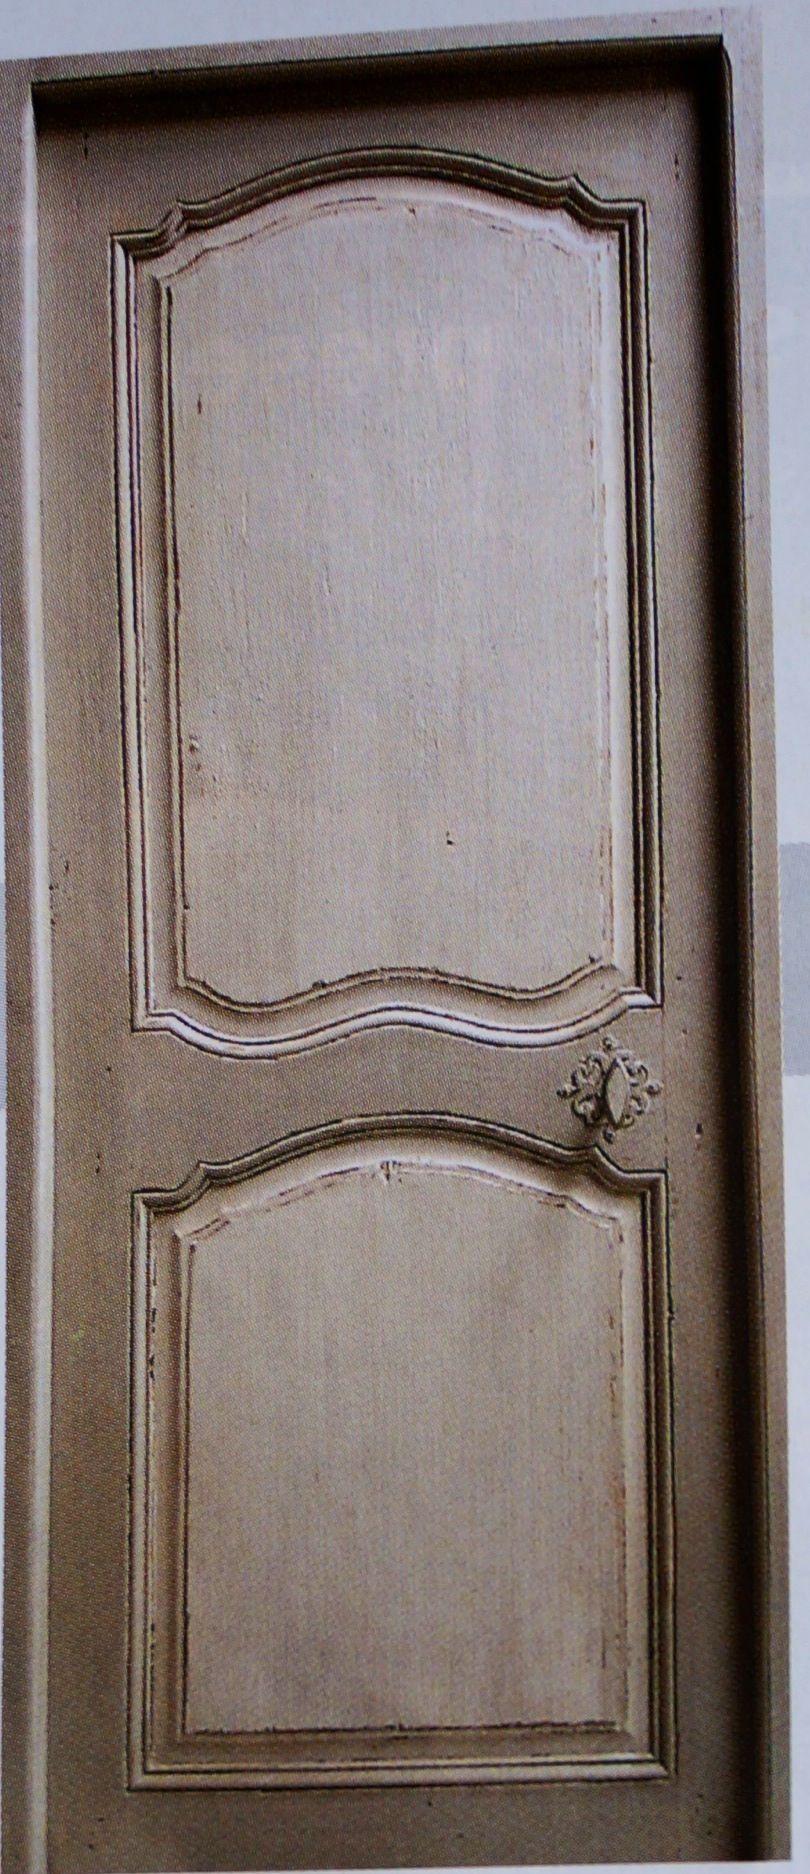 Porte couleur Taupe | Boiserie | Pinterest | Couleur taupe, Taupe ...